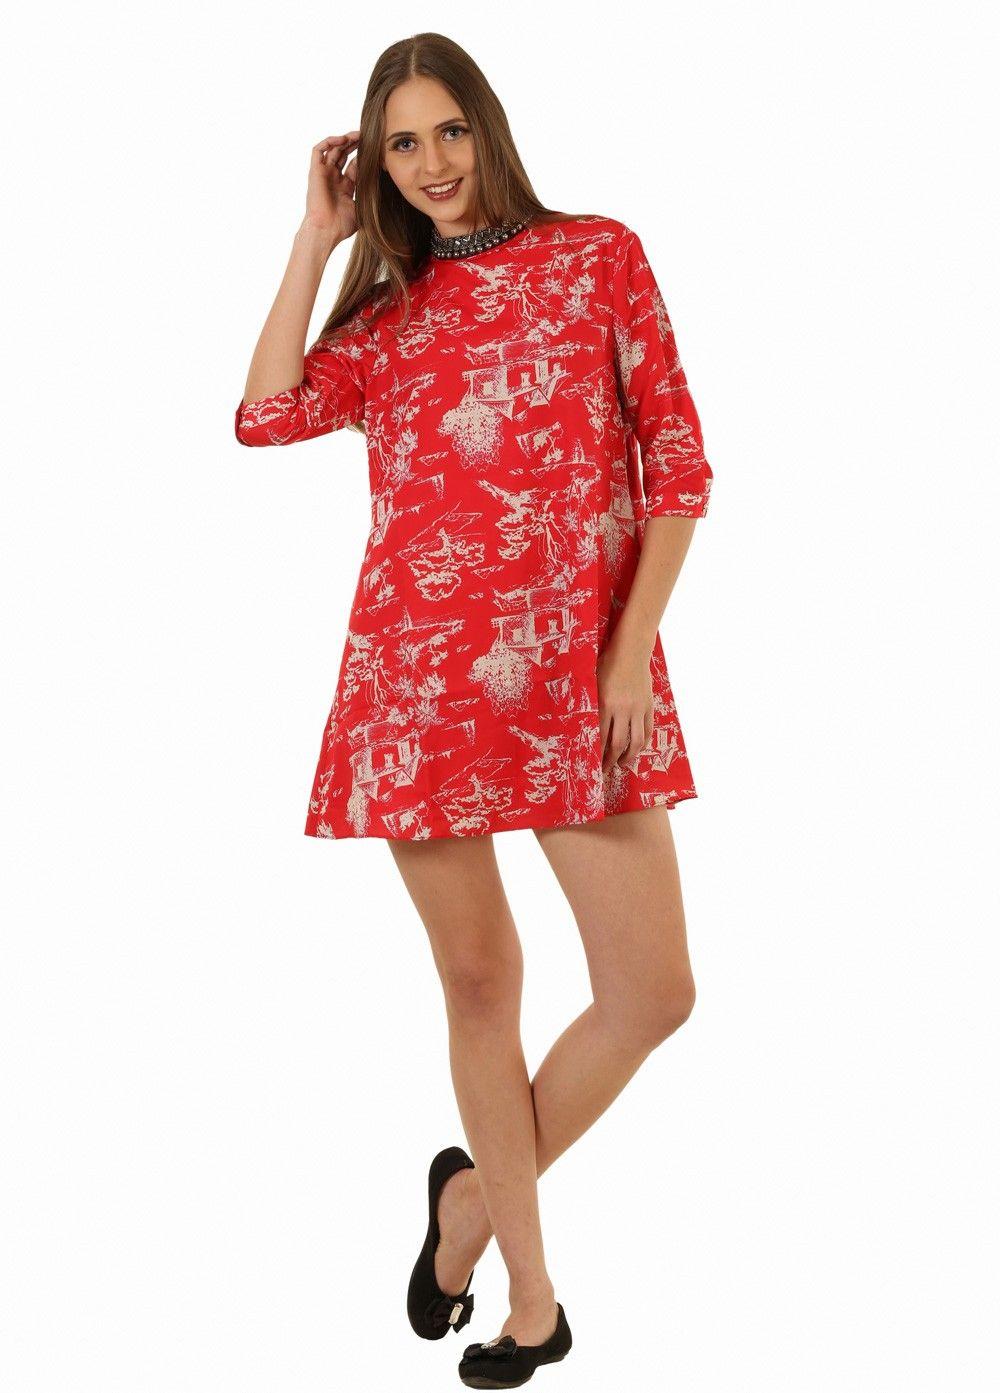 Red Embroidered Net Western Dress For Women -partywear -shortdress ...